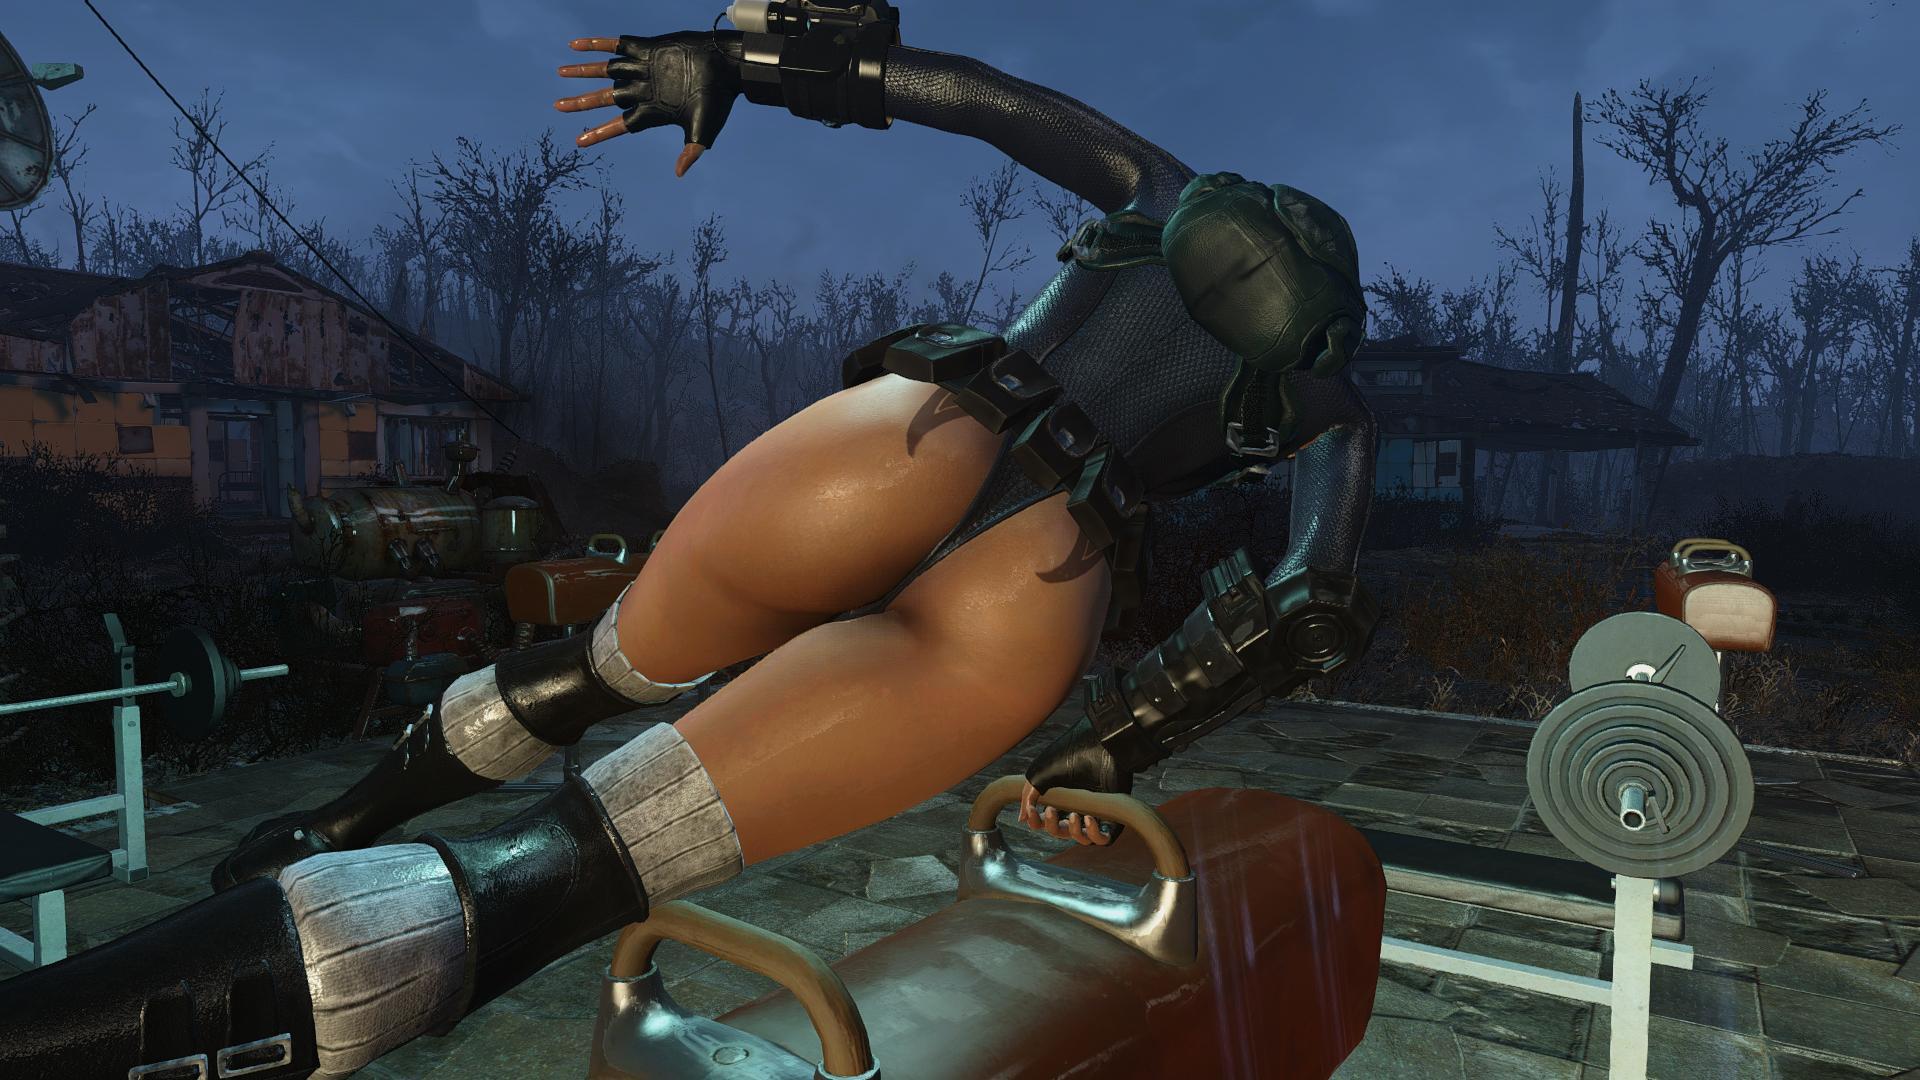 000580.Jpg - Fallout 4